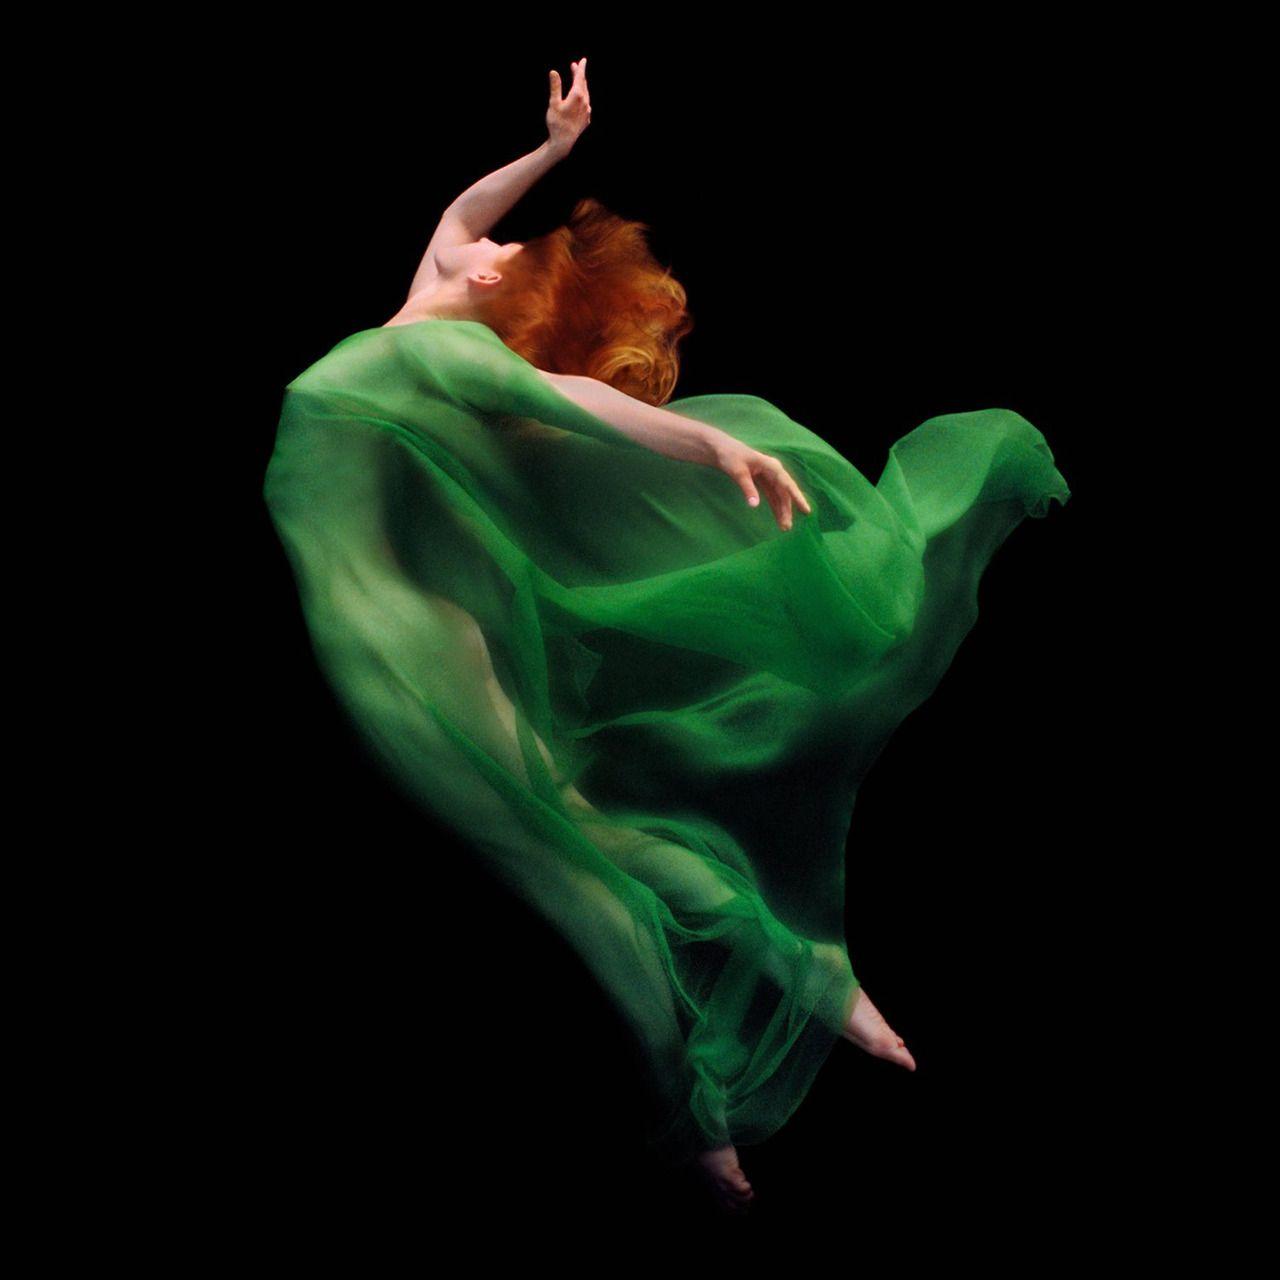 Underwater Study #3200, 1998. Howard Schatz. Pigment Print - #ballet #experimental #foto #fotografía #fotografie #photographie #photography